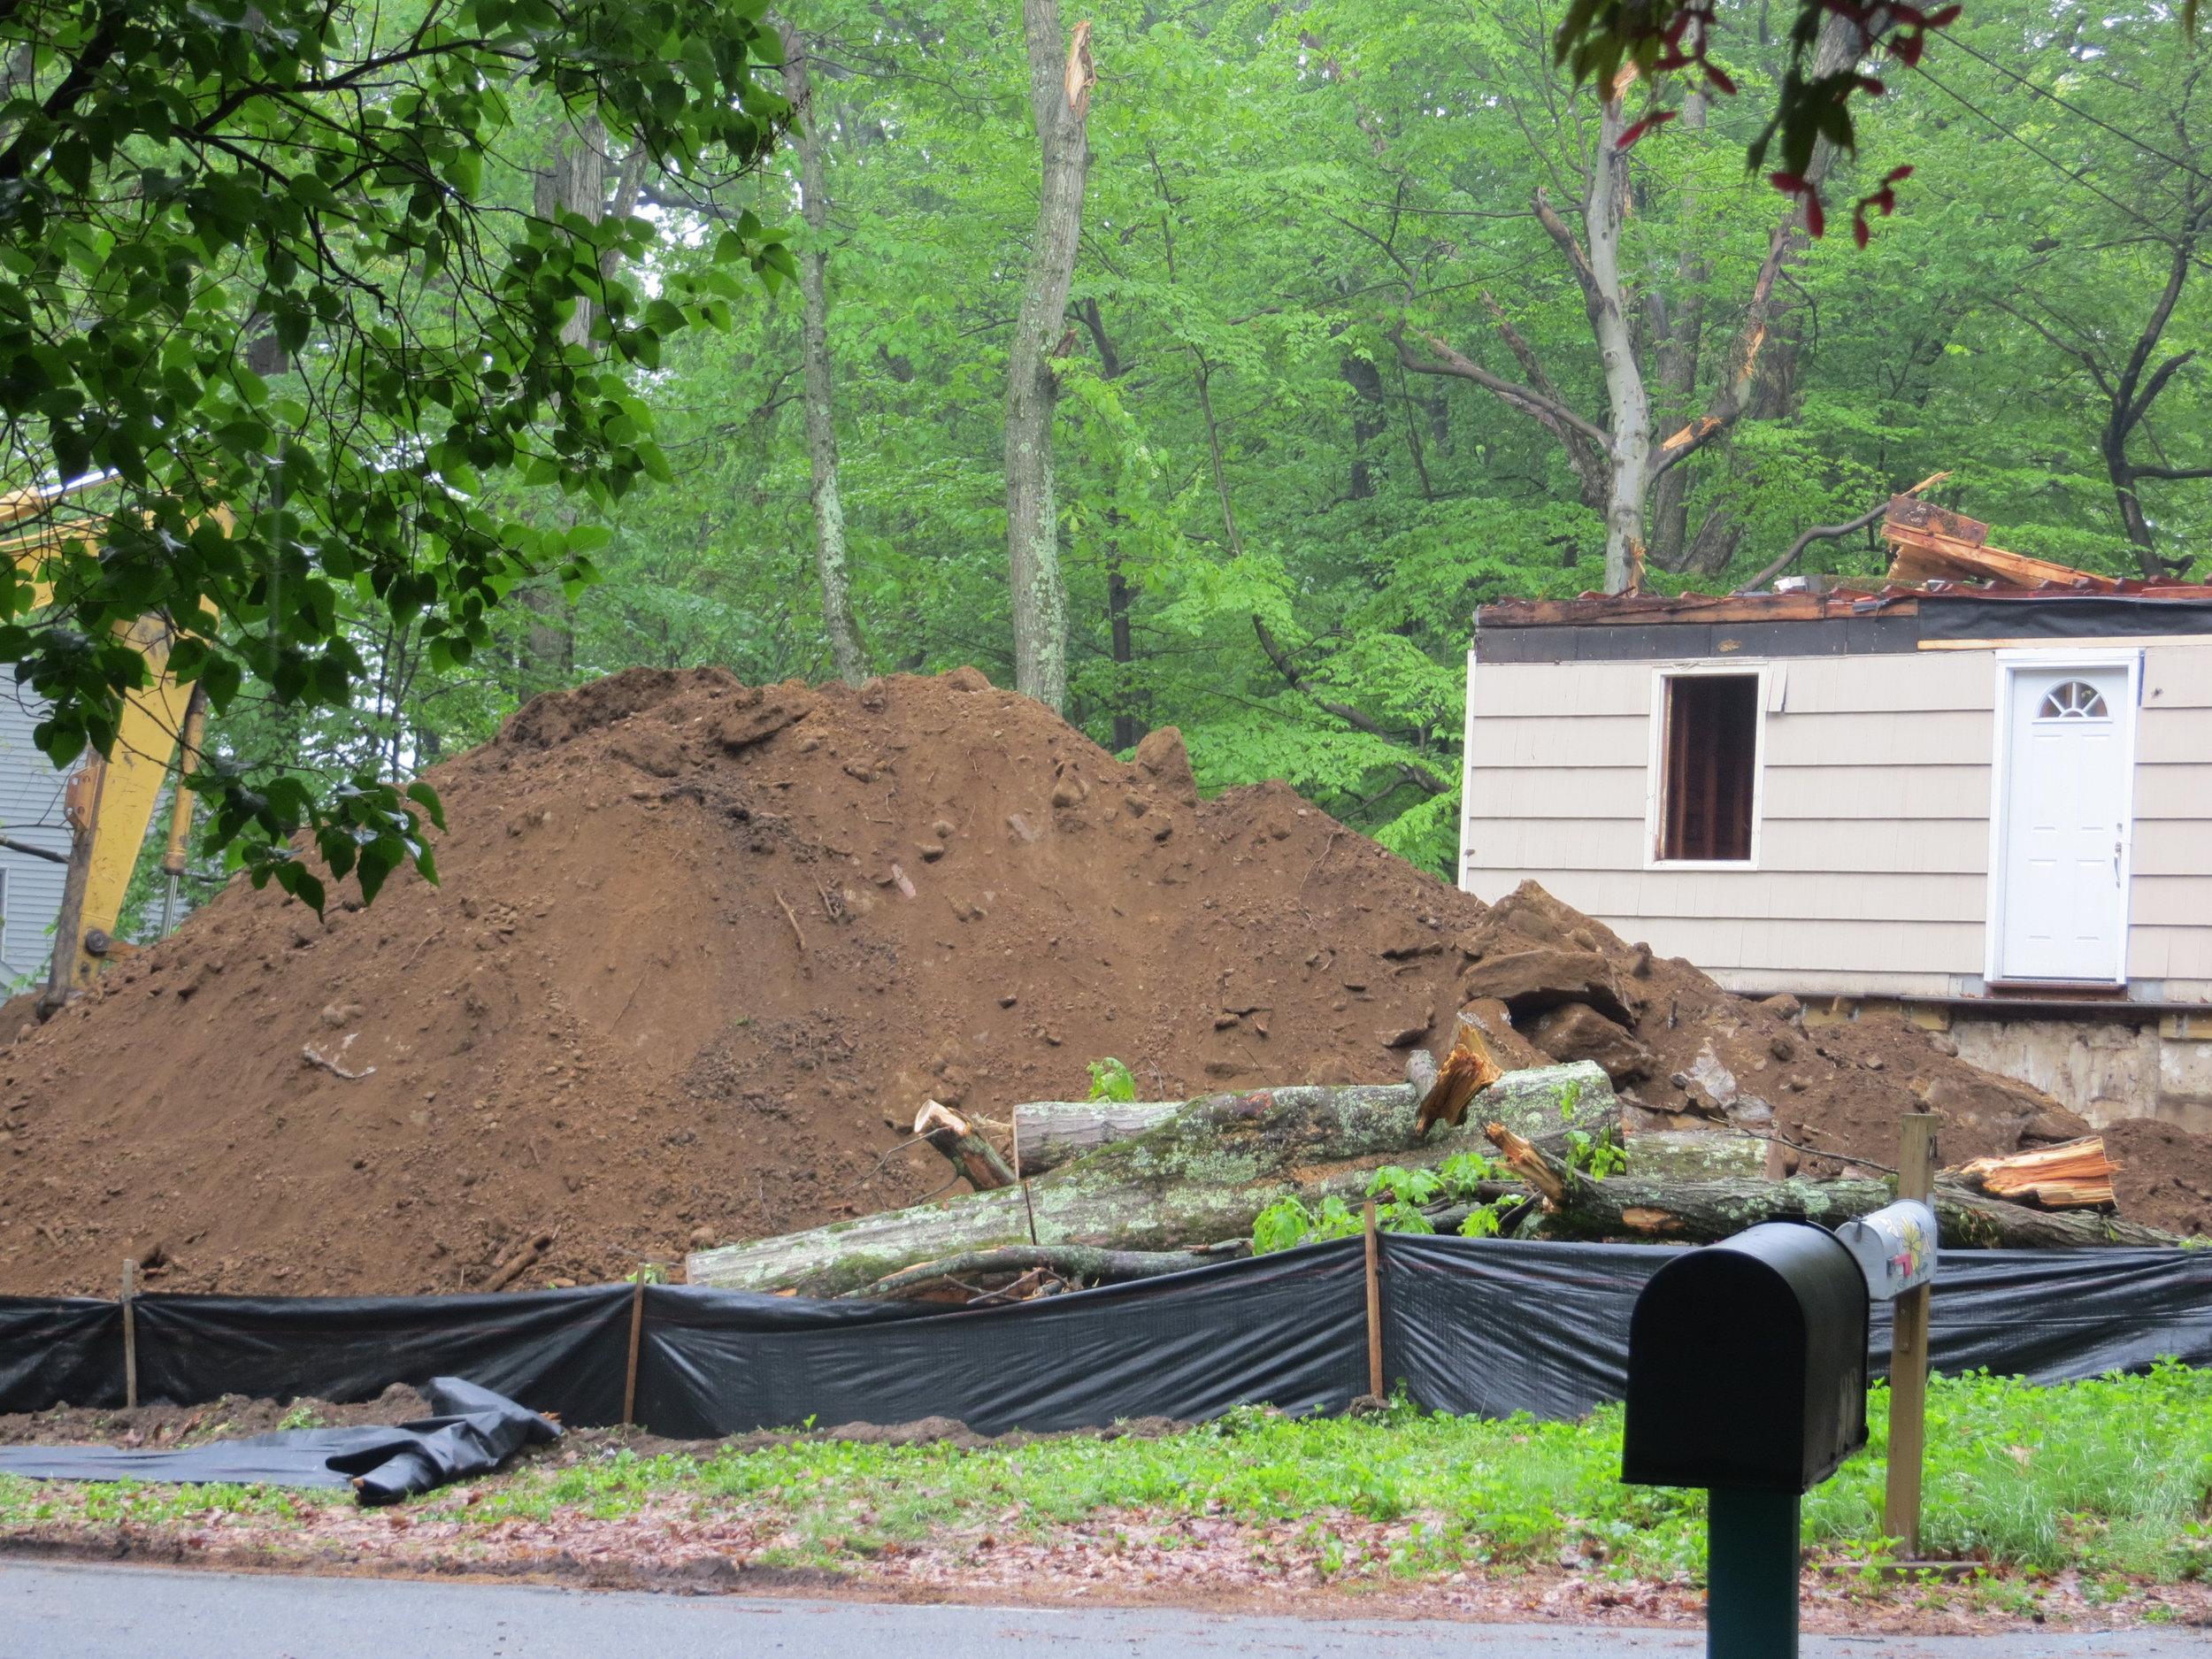 2014 05 22nd Carl's House & Yard (2).JPG